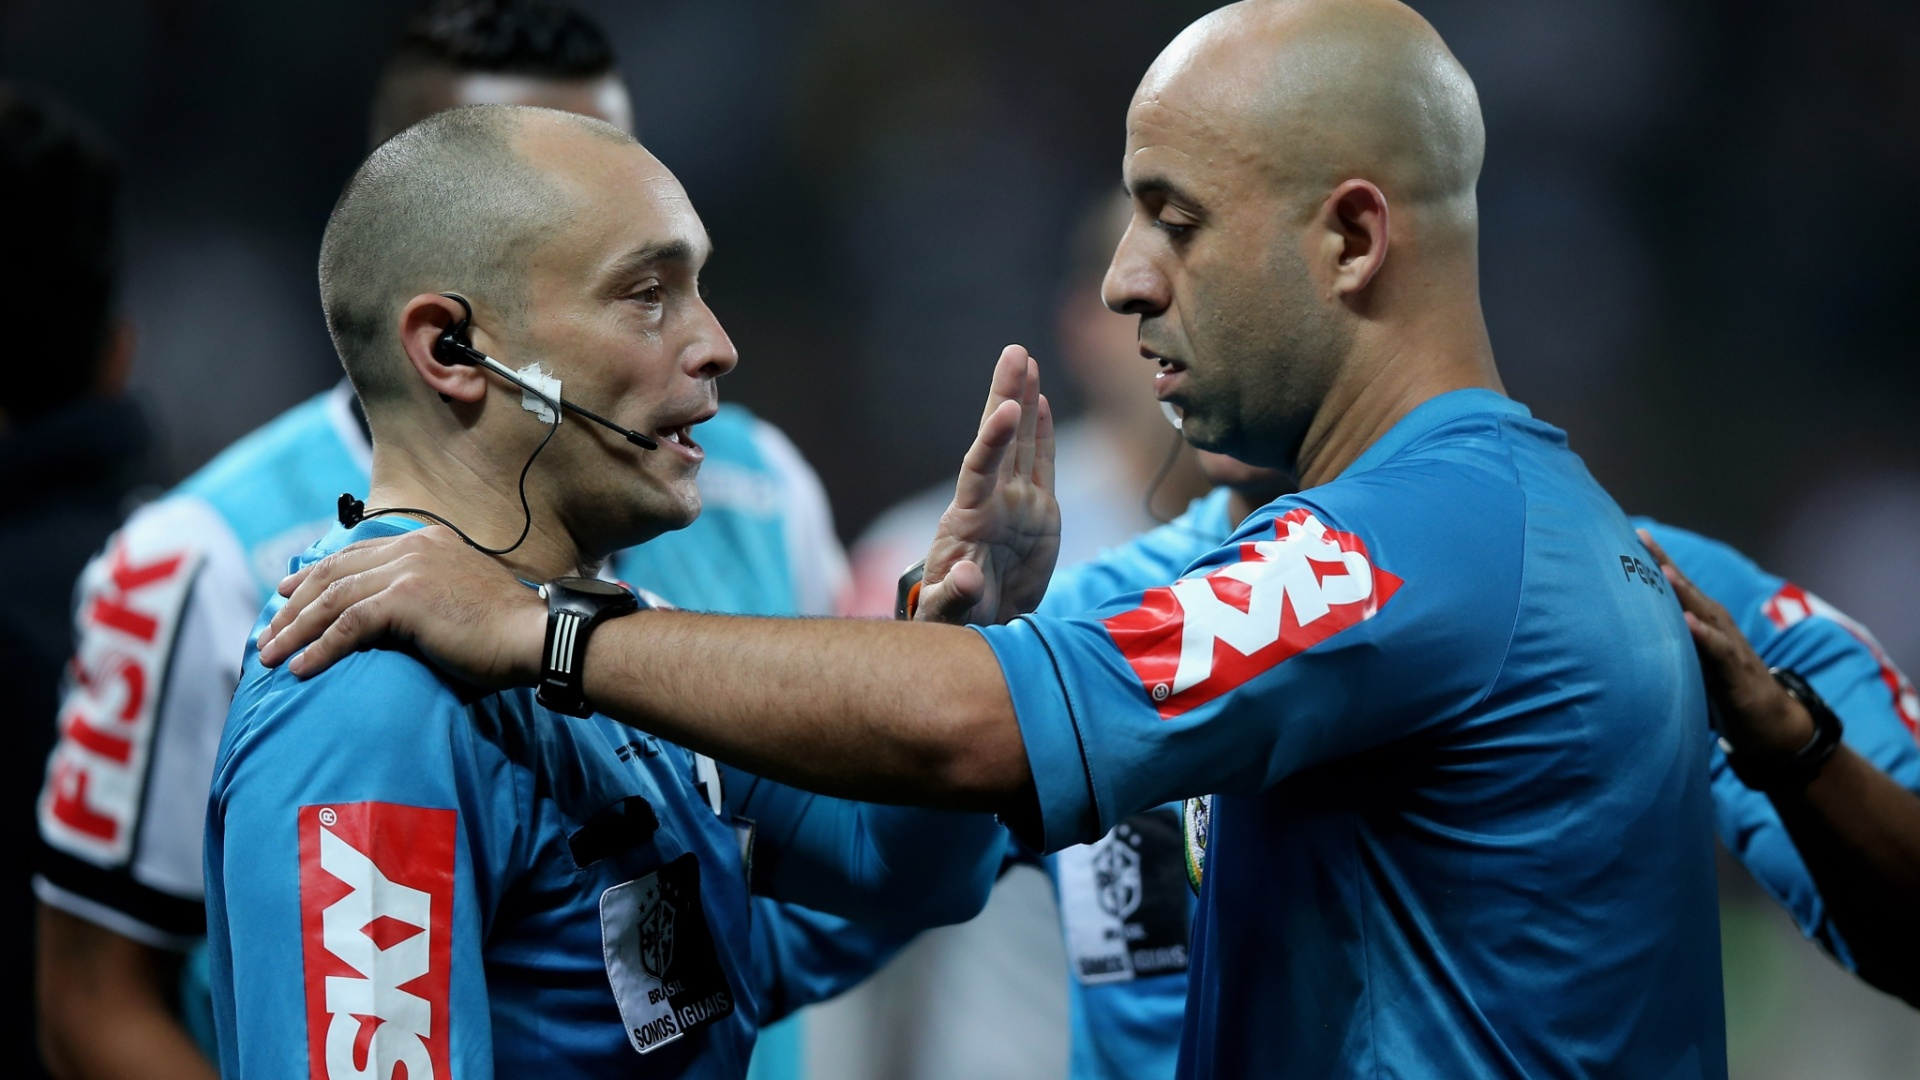 Jean Pierre conversa com seu auxiliar na partida entre Corinthians e Coritiba